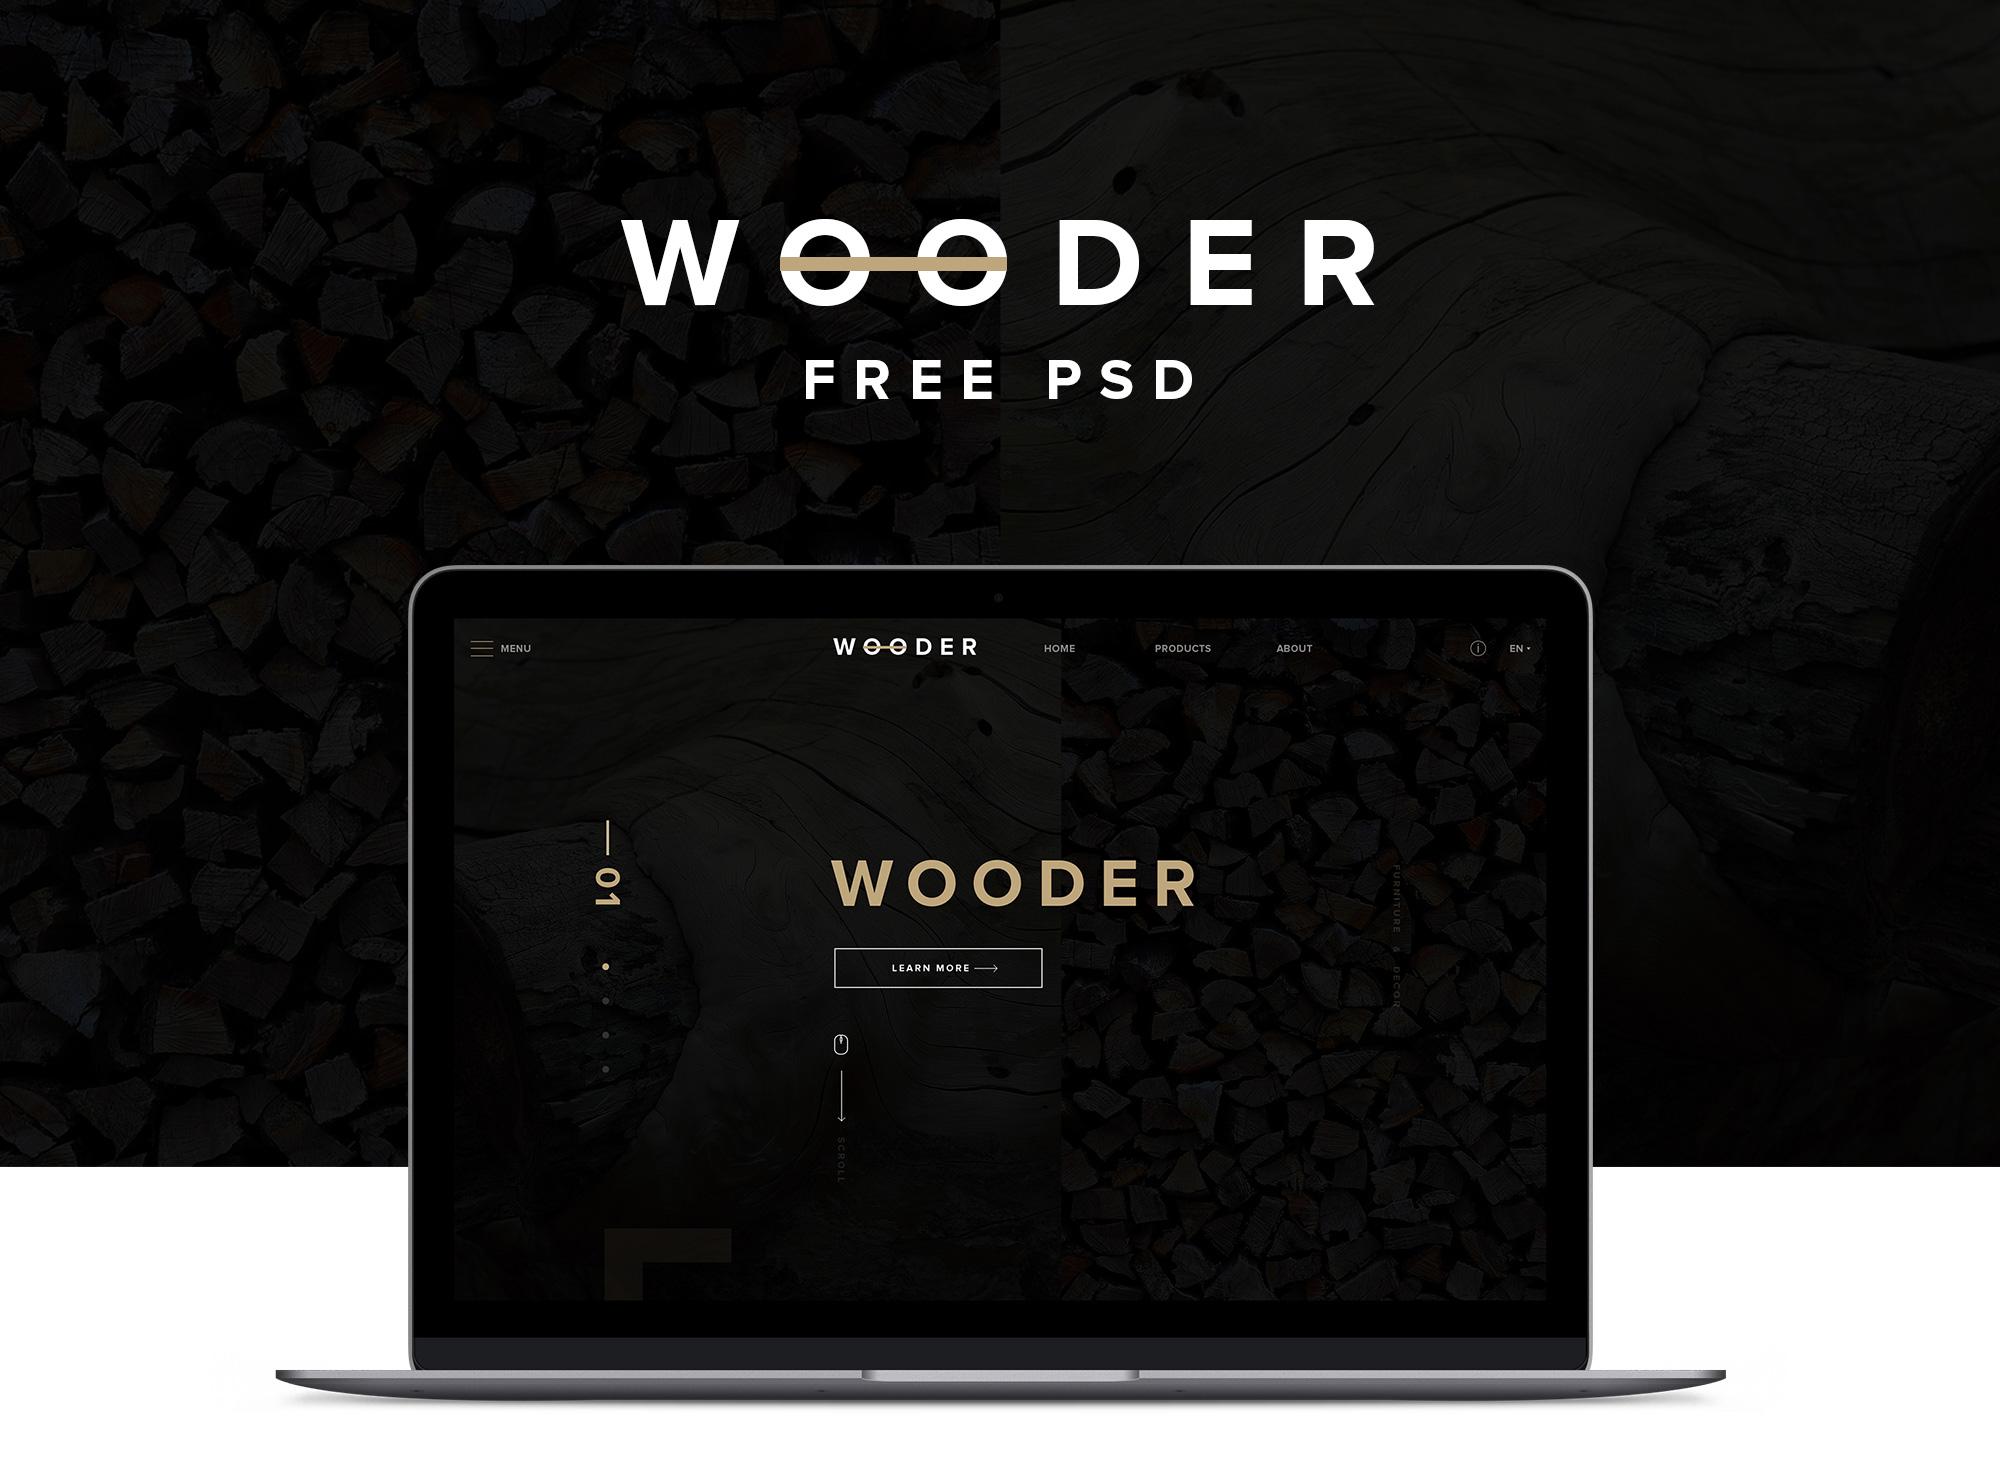 Modern Wood Company Free PSD resource